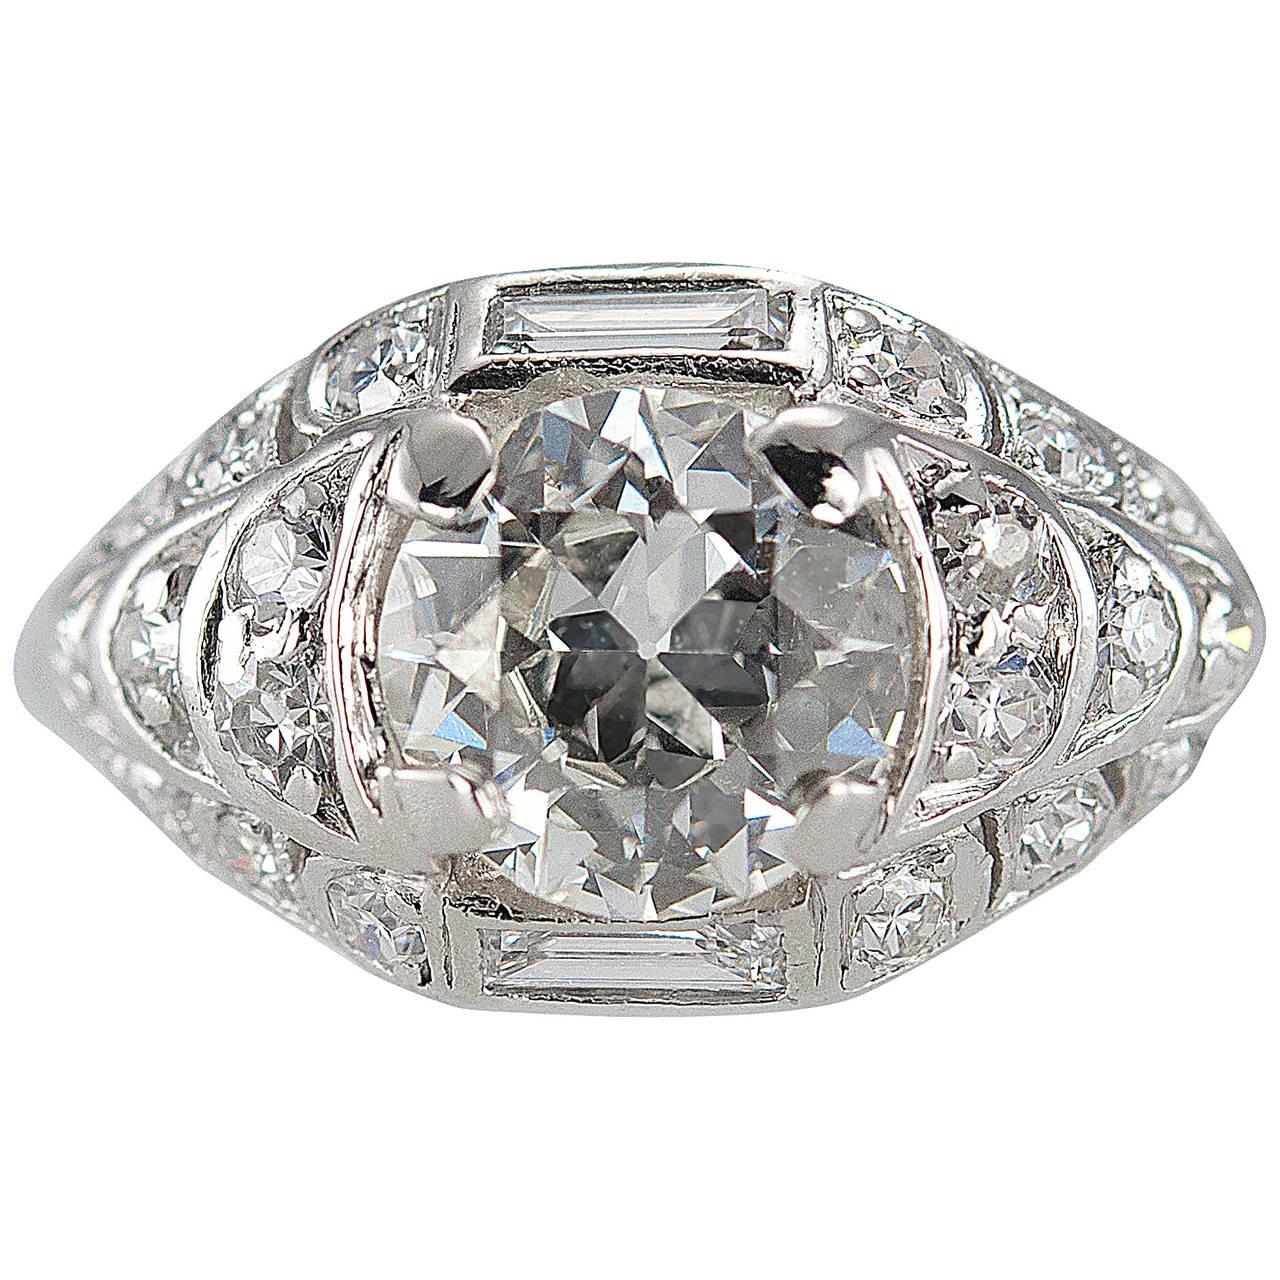 1.18 Carat Old European Cut Diamond and Platinum Engagement Ring